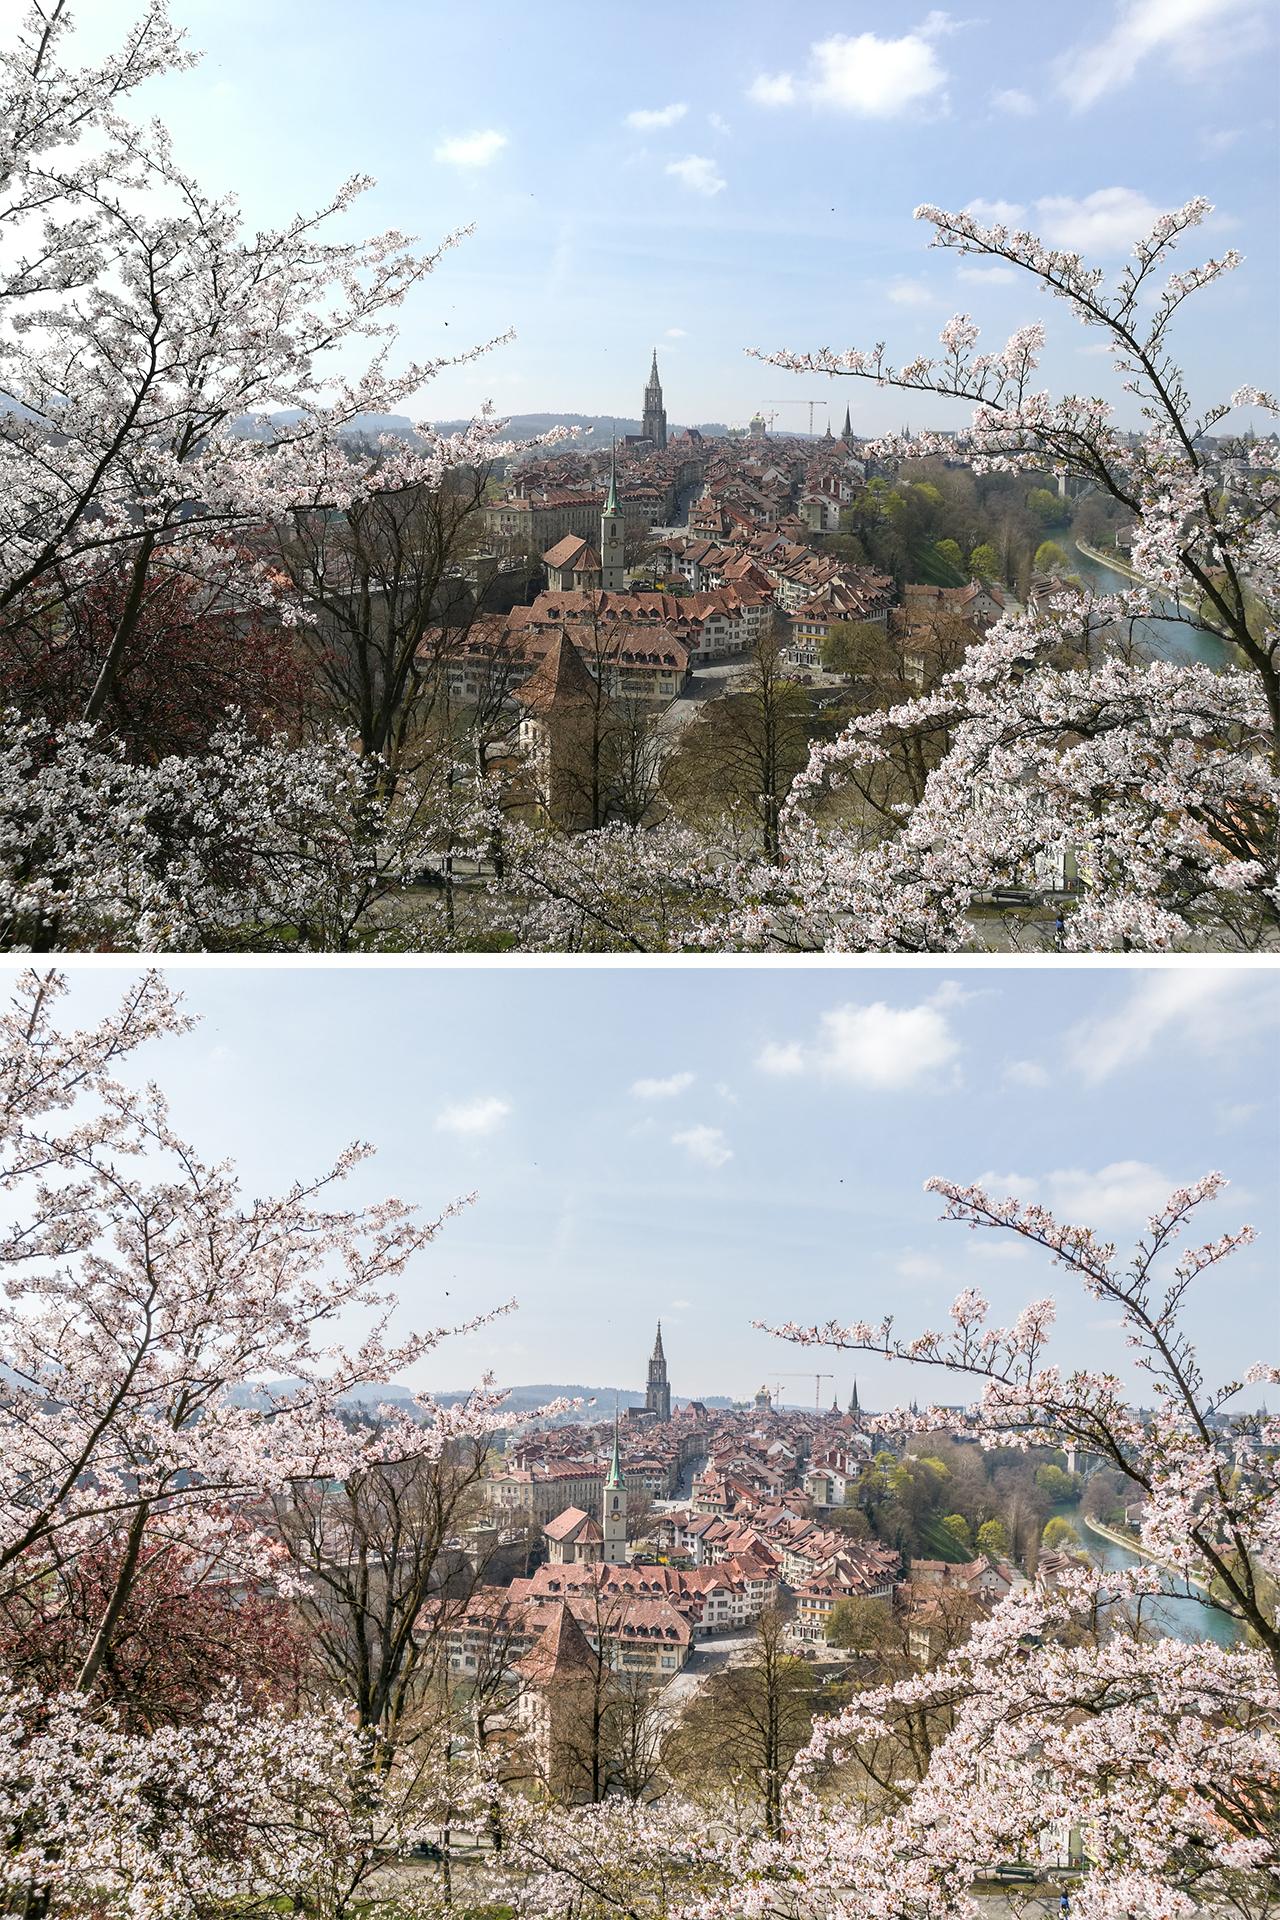 Huawei-p9-Testbild-Bern-Rosengarten-vergleich